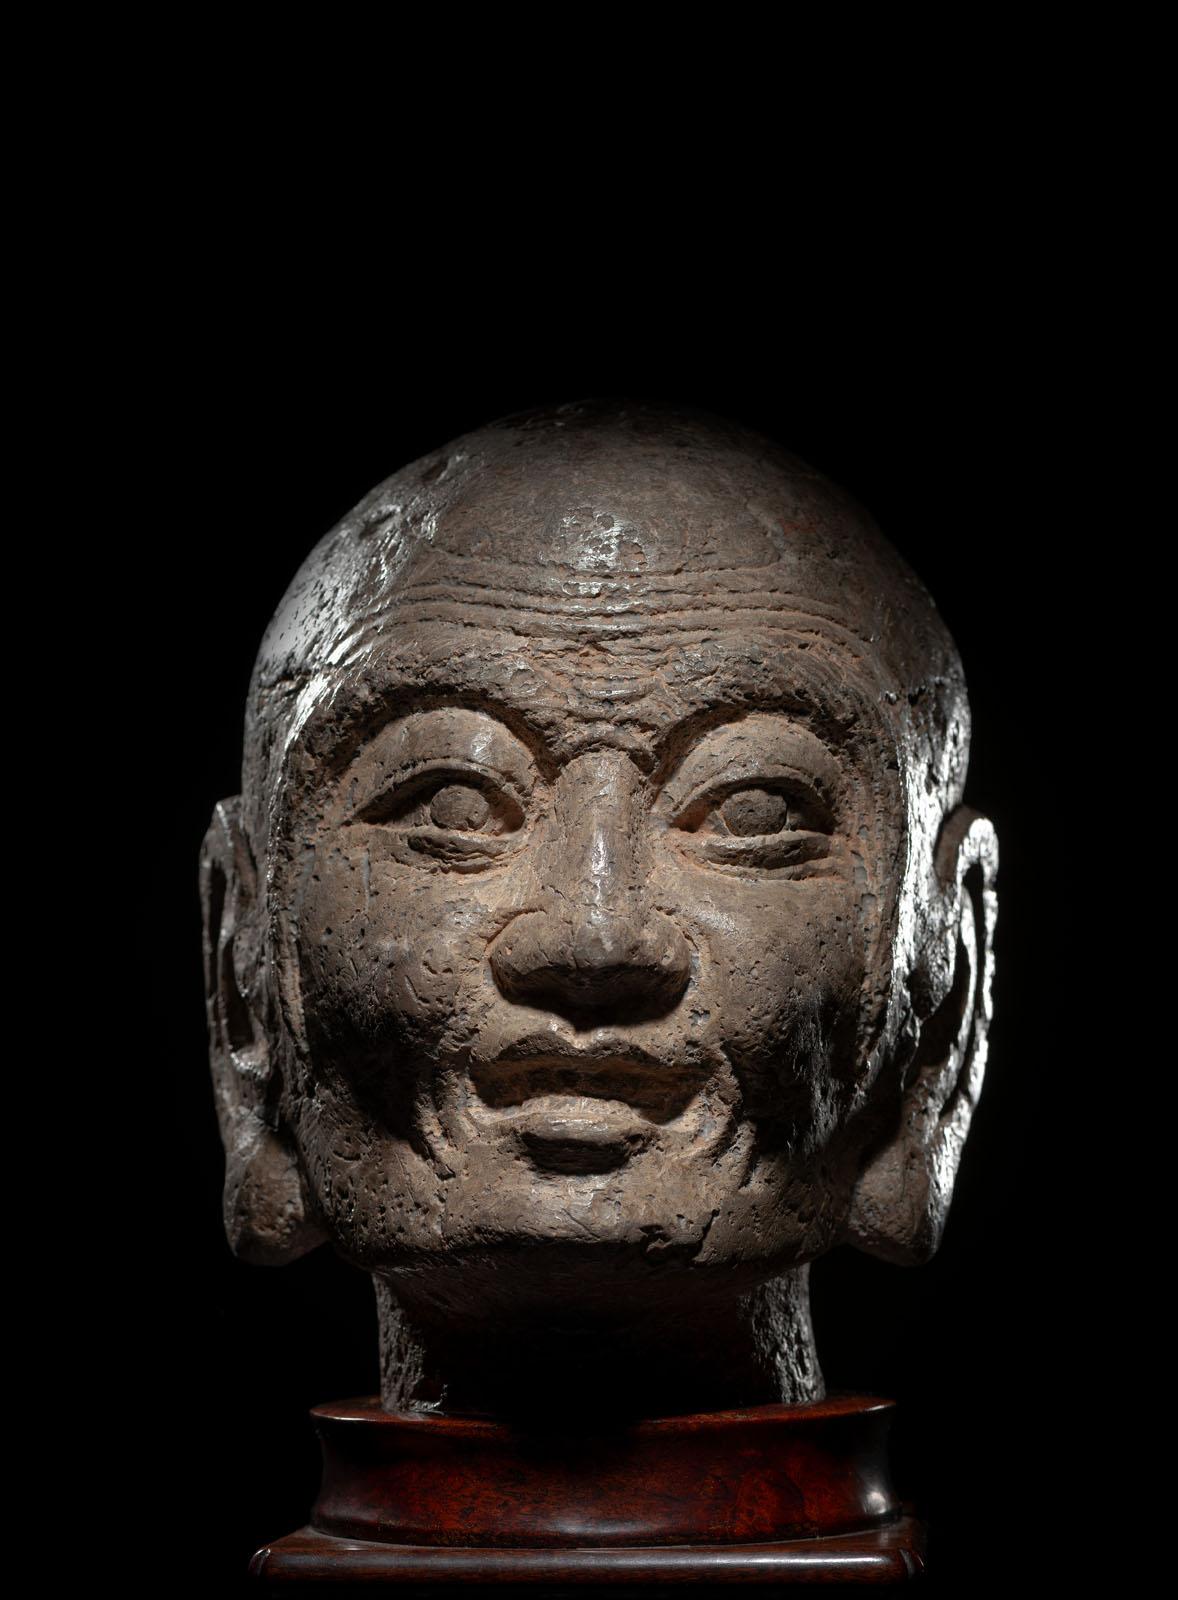 A RARE STONE HEAD OF PROBABLY KASYAPA